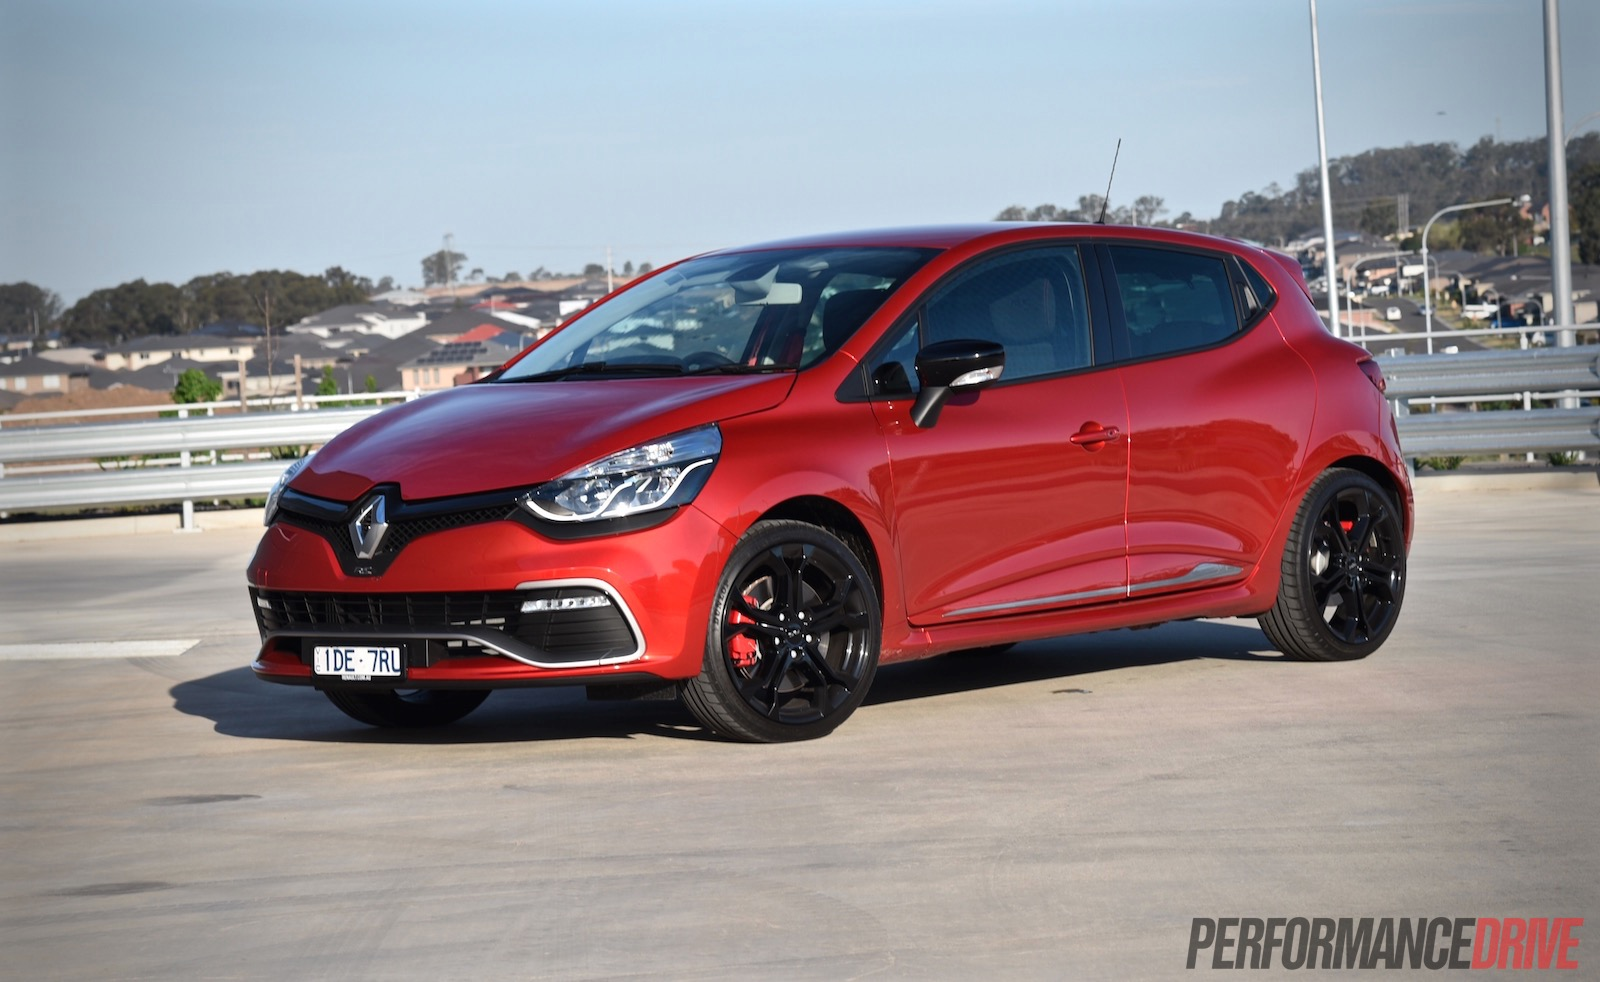 Renault clio reviews australia